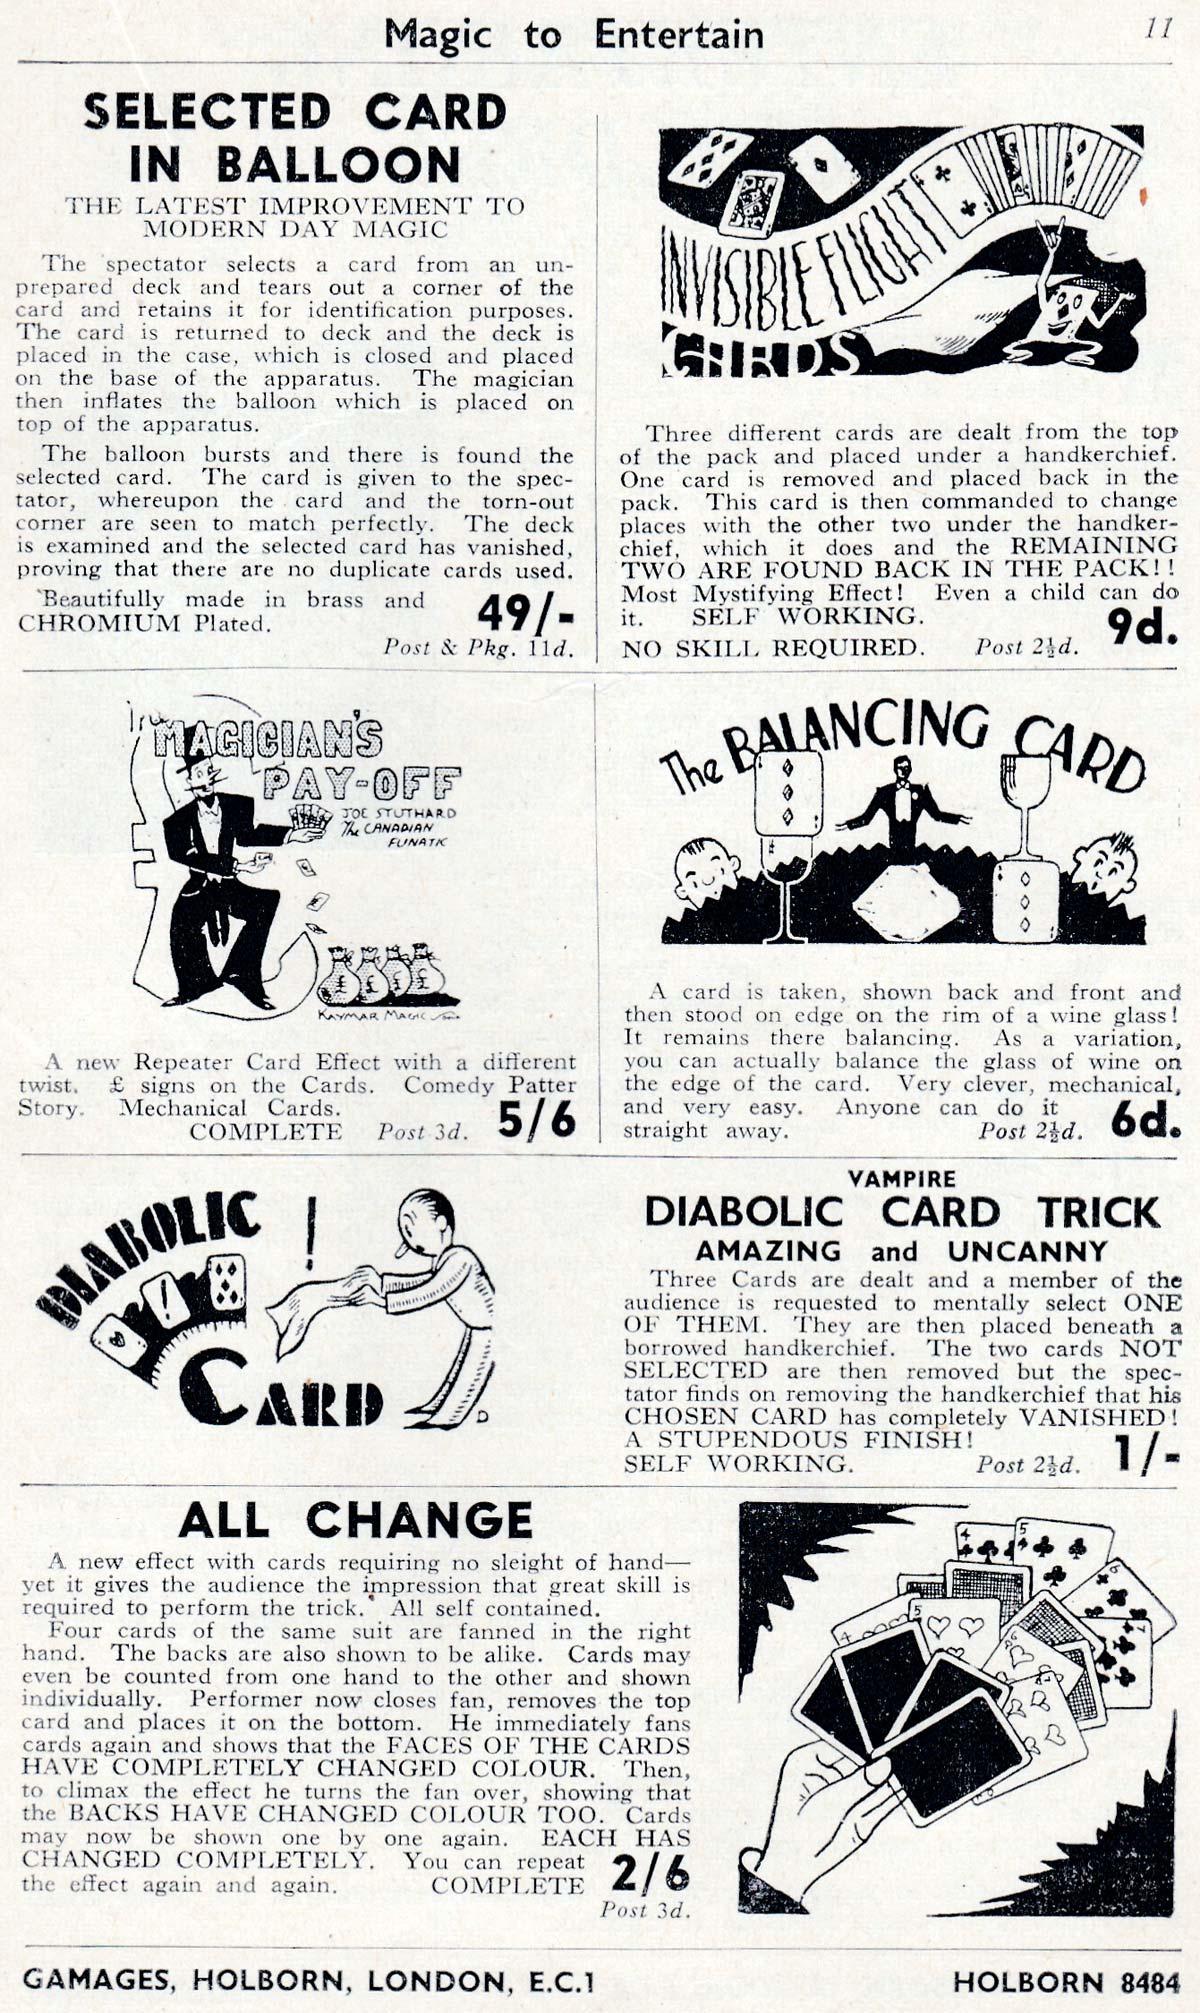 Gamagic Catalogue of Magic Card Tricks, c.1940